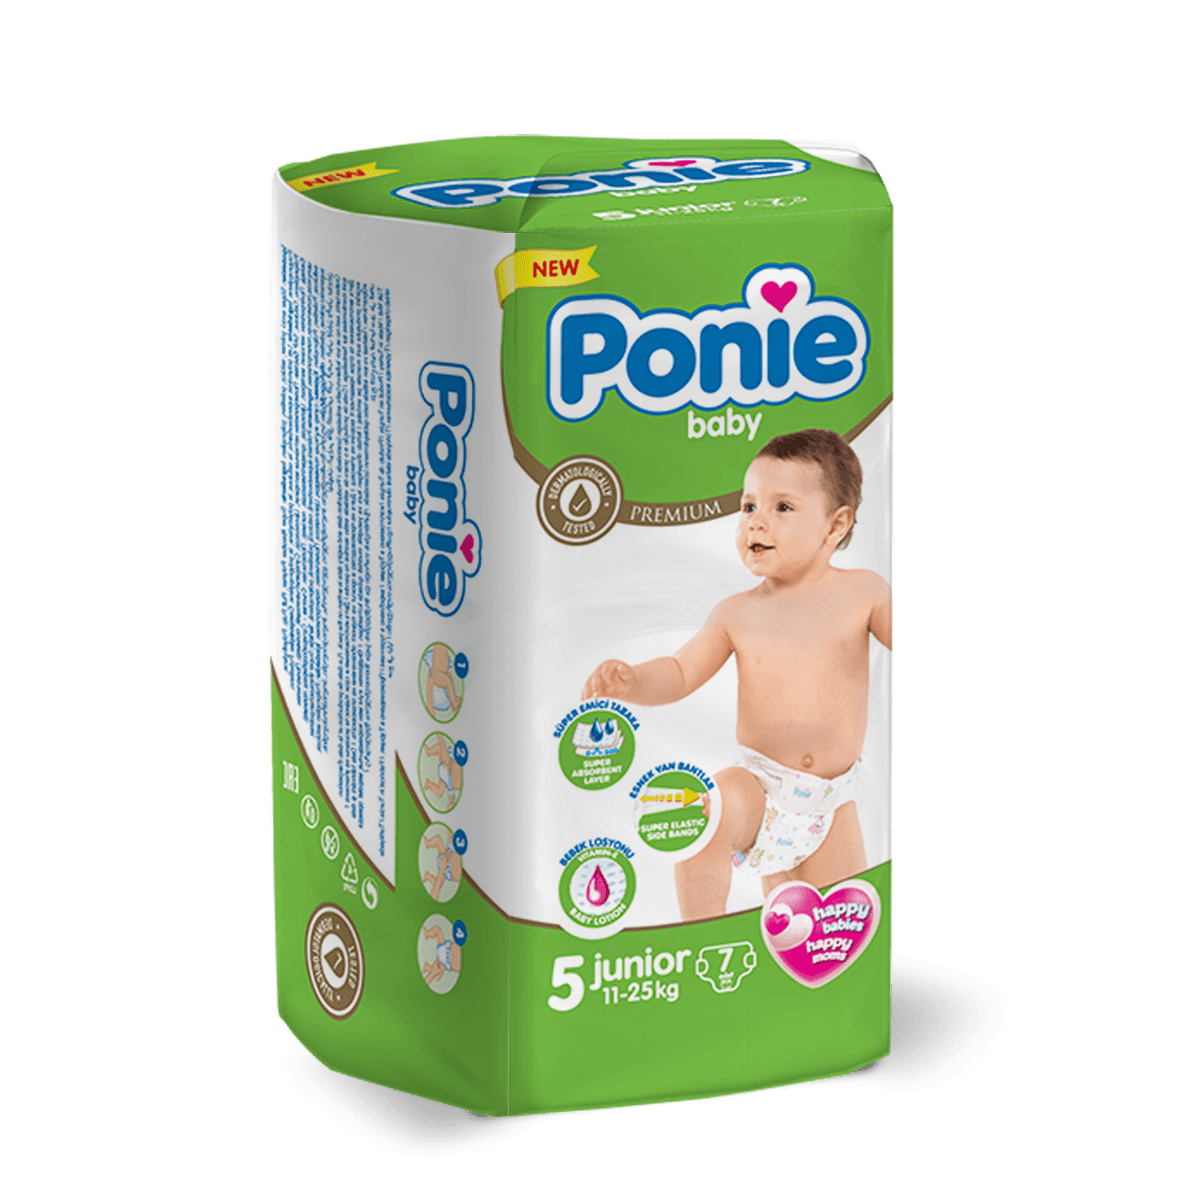 PONIE BABY JUNIOR ( 11-25 Kg ) Küçük Paket